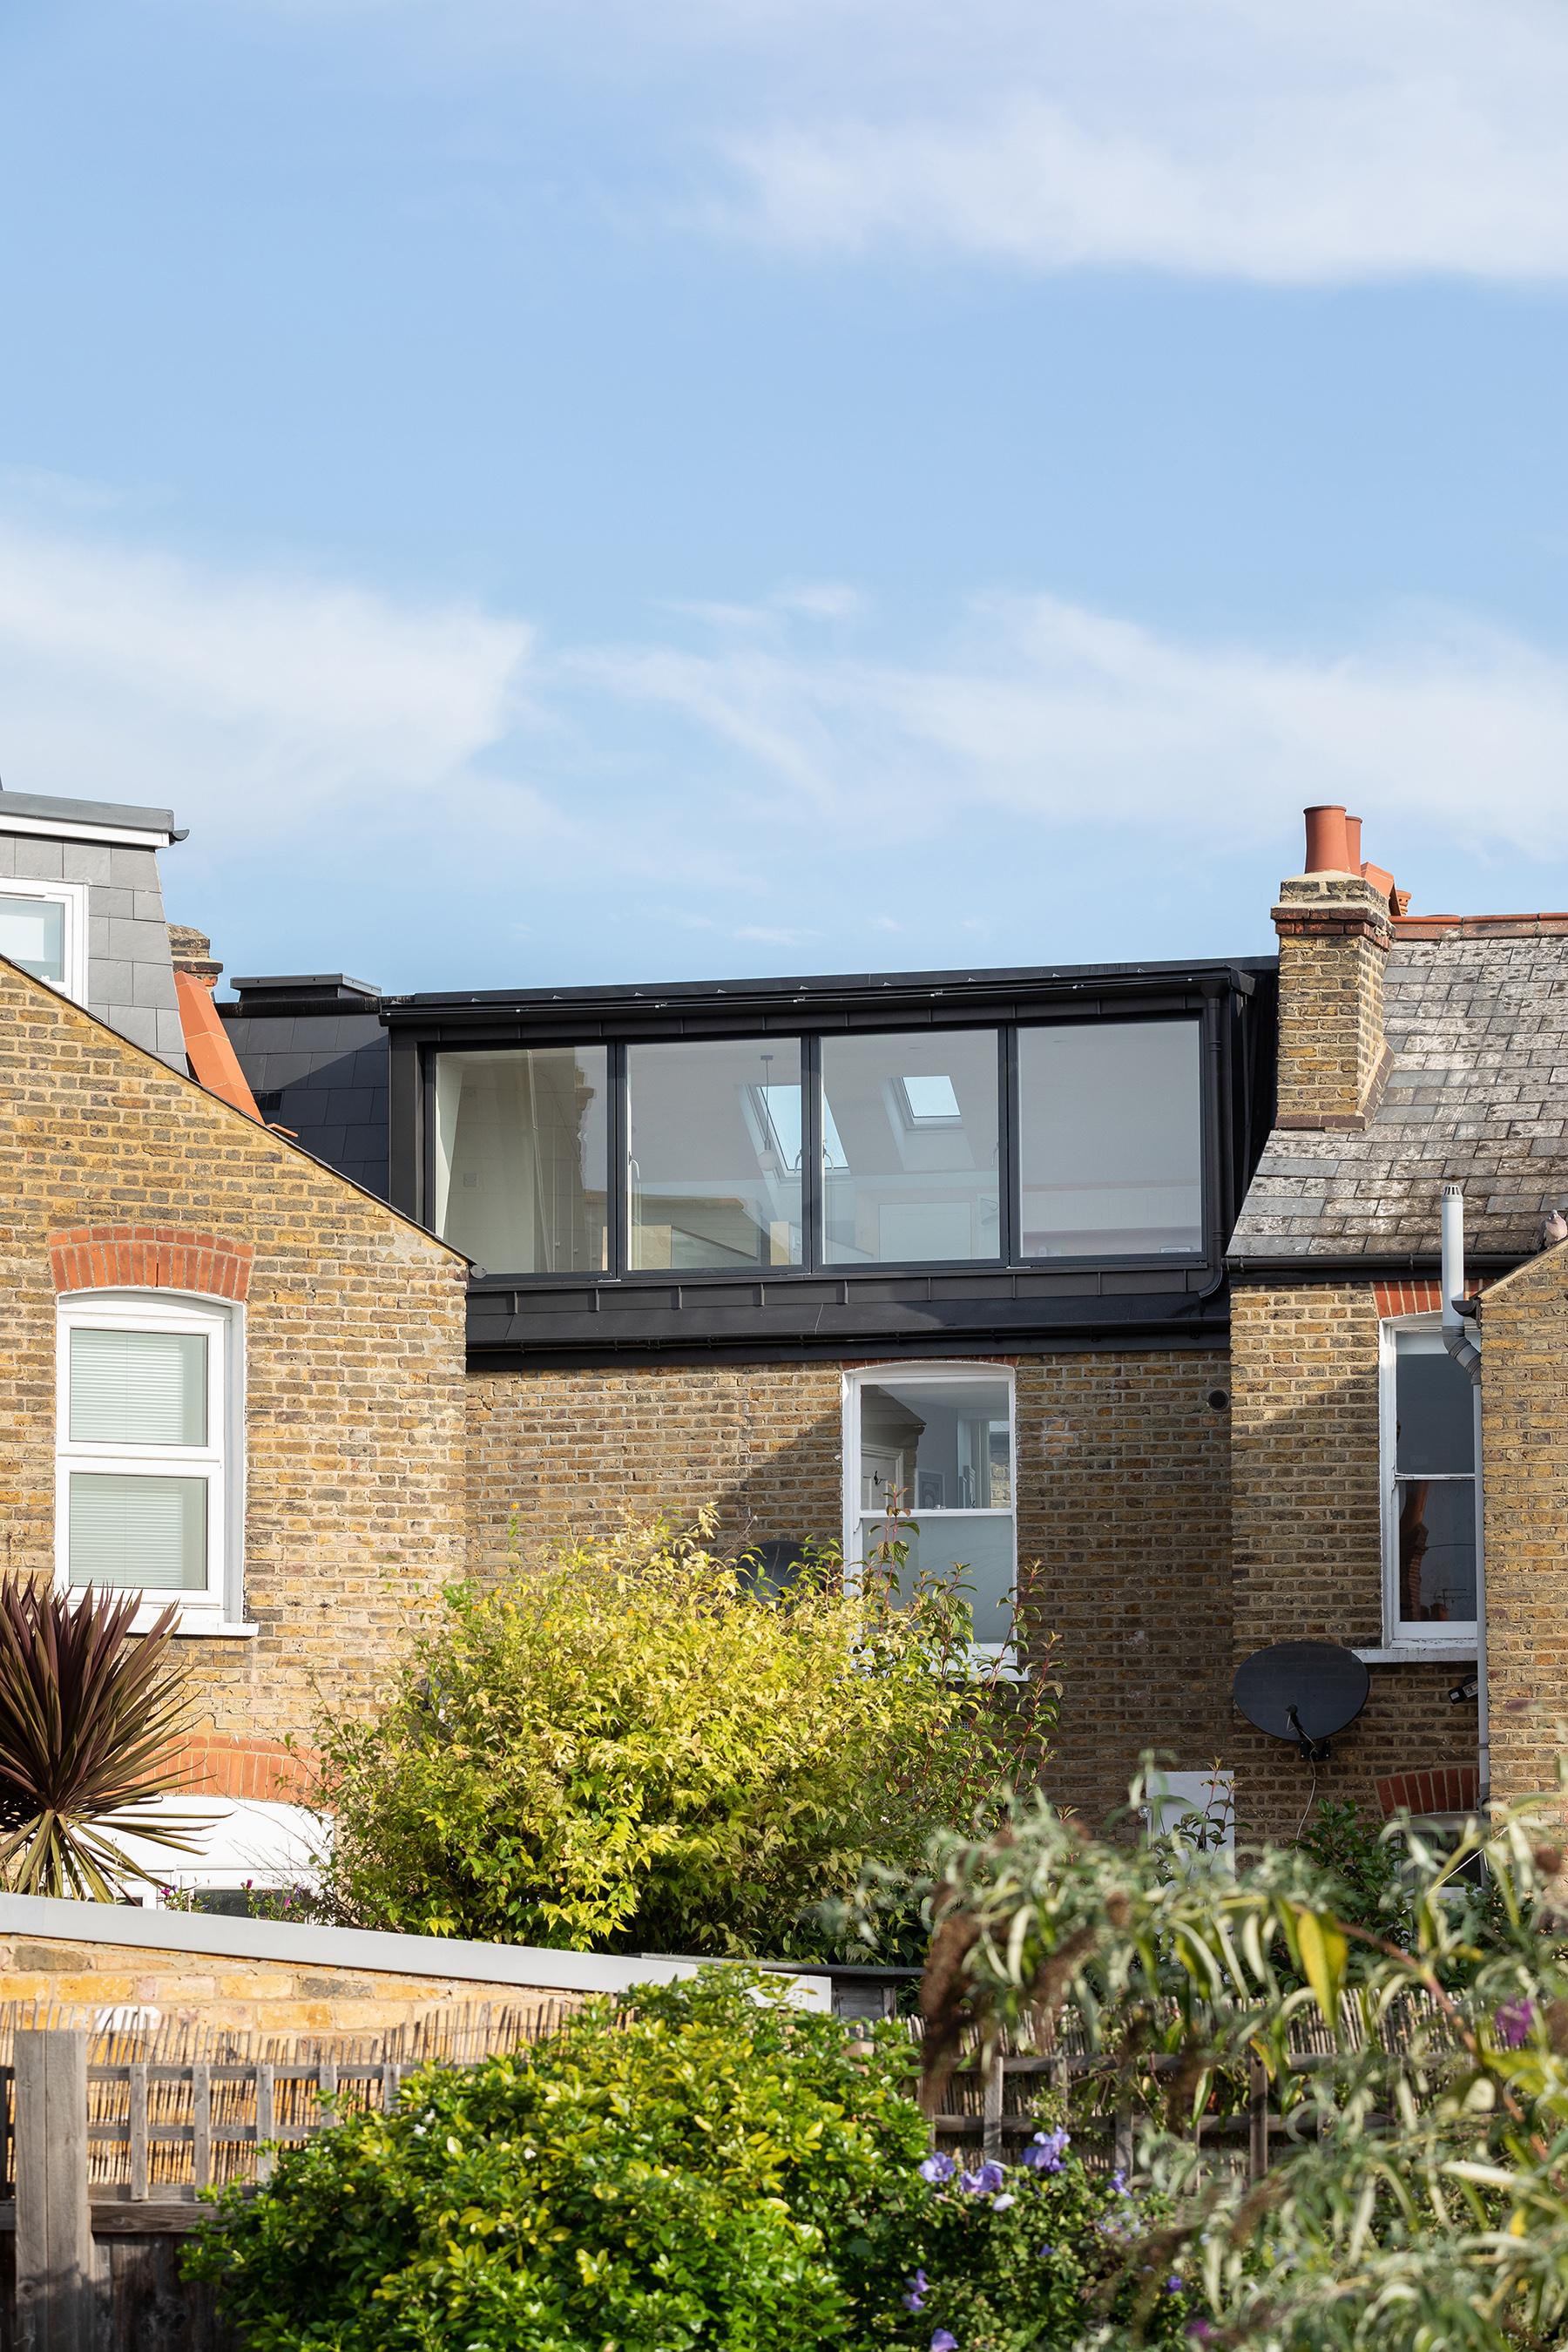 01-smeaton-road-victorian-house-roof-extension-loft-conversion-site-photo-architecture-wandsworth-south-london-uk-rider-stirland-architects-adam-scott.jpg